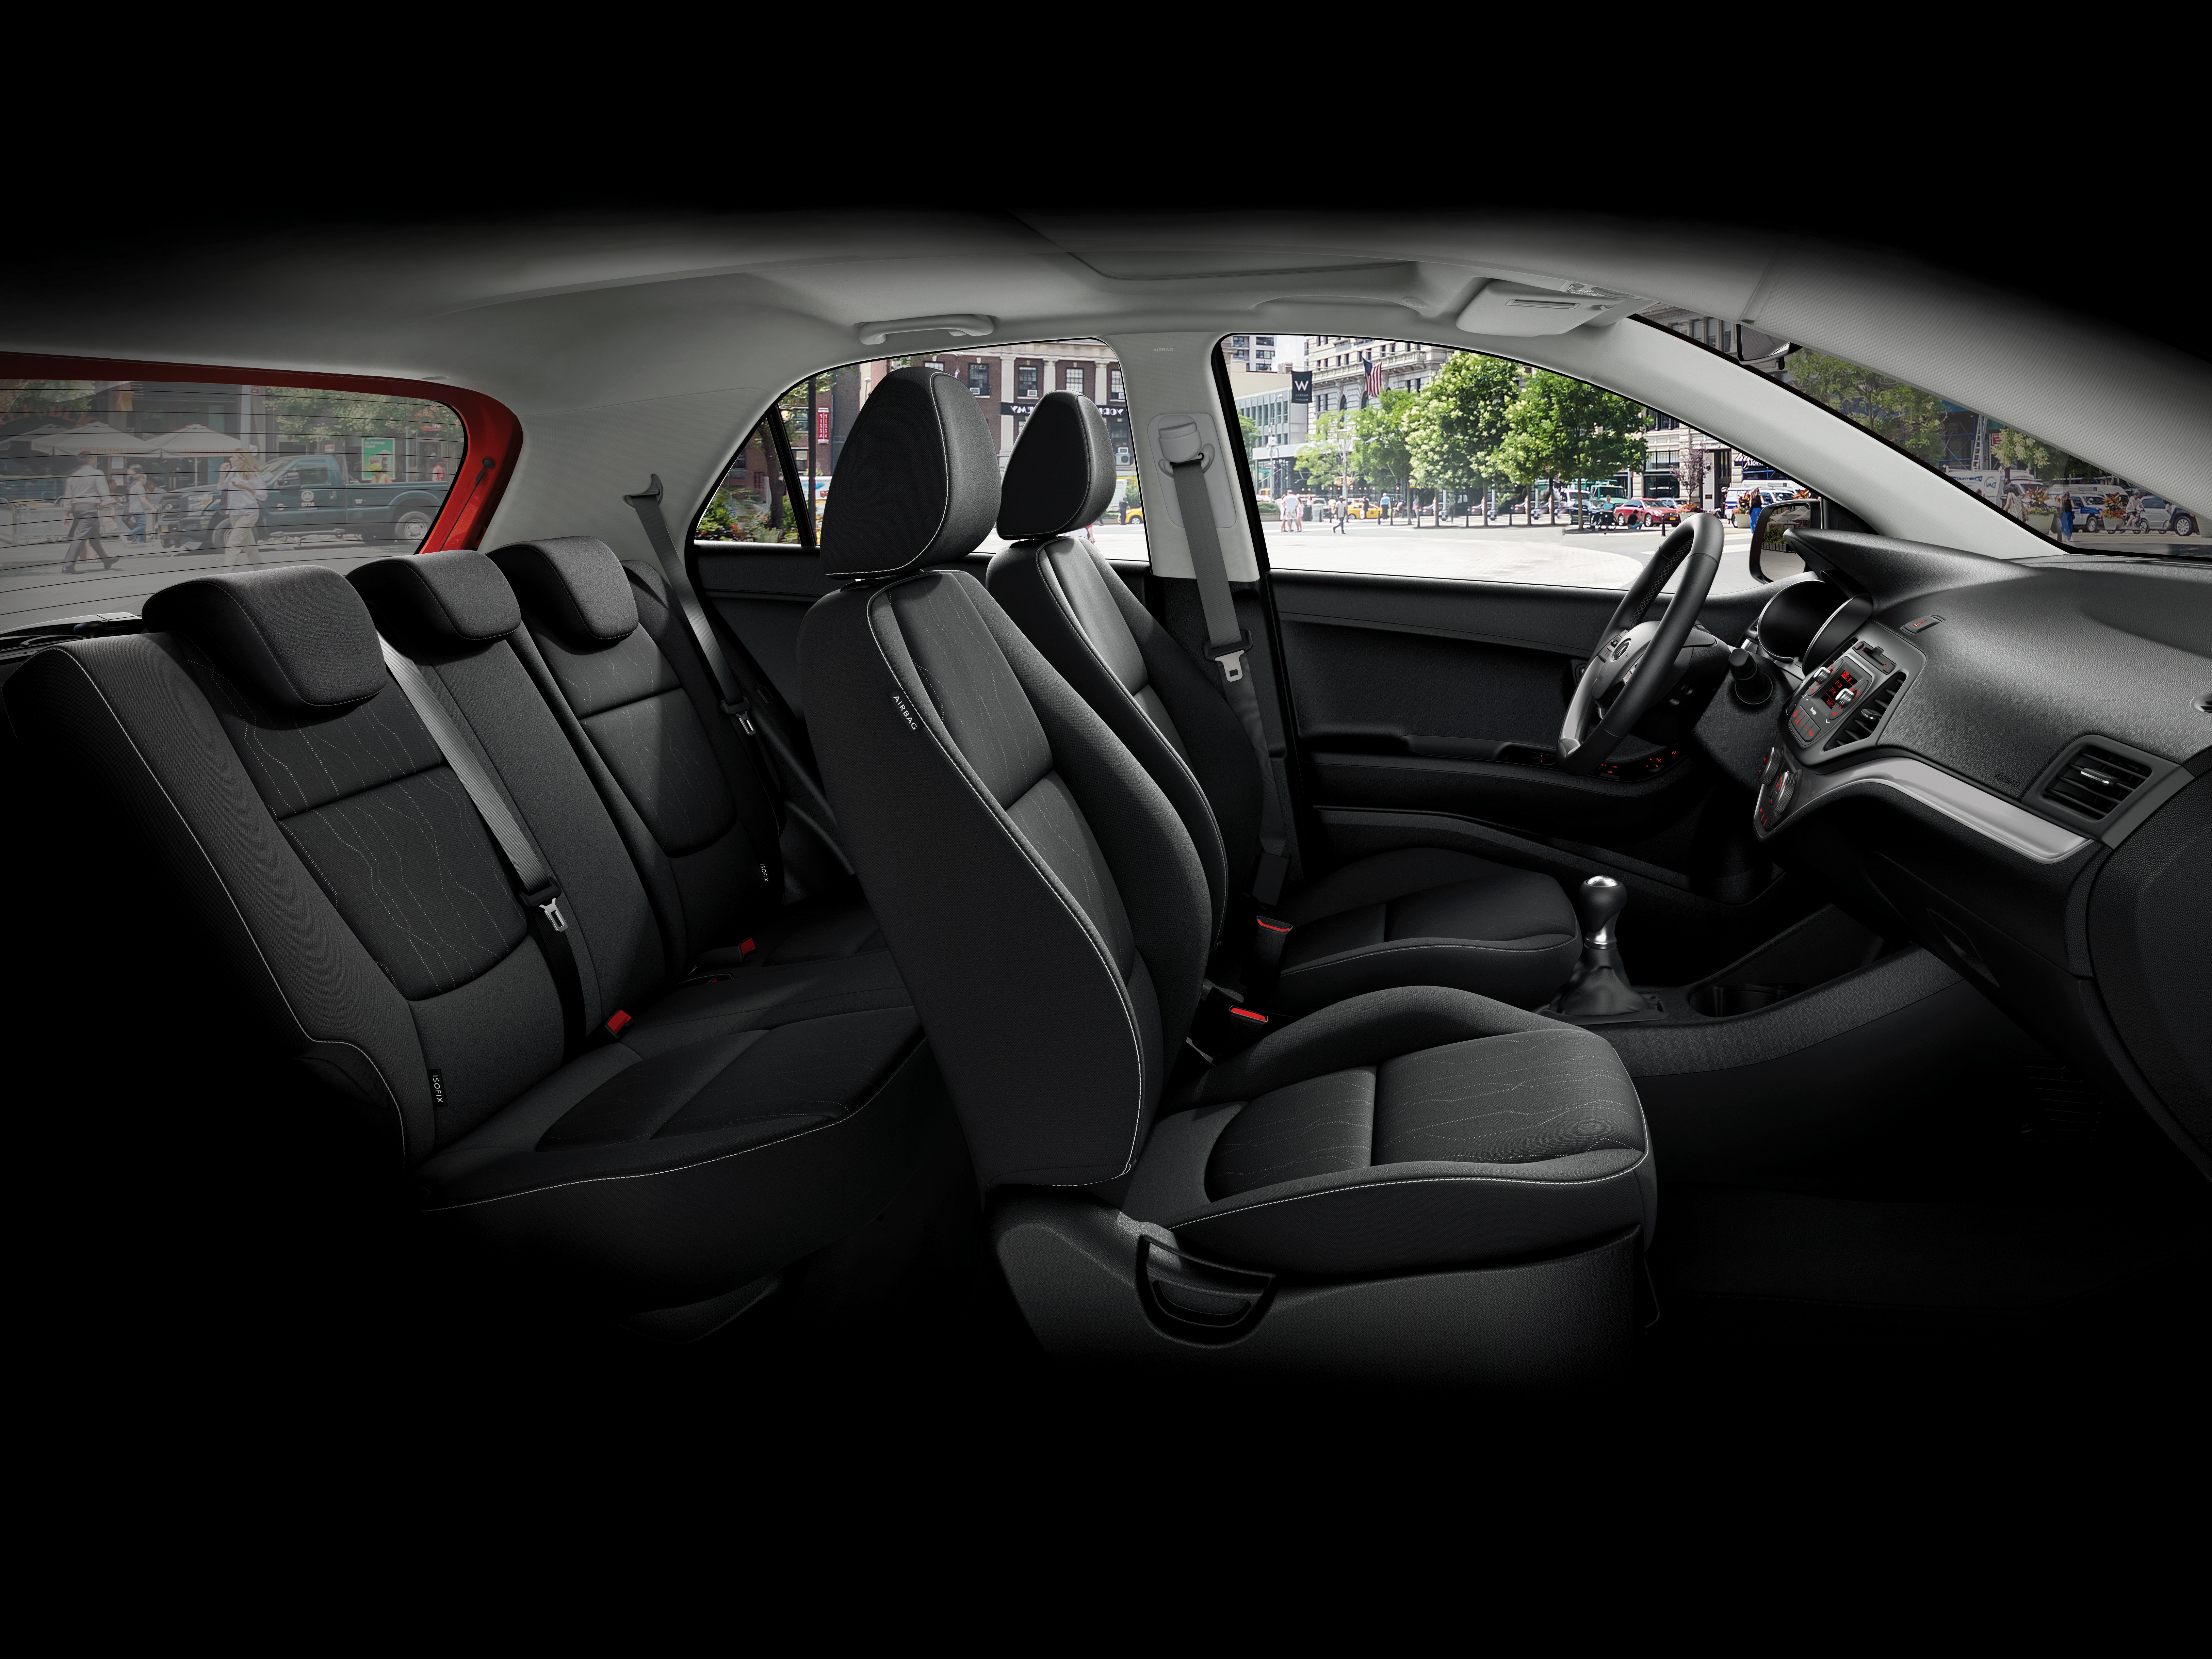 Kia to reveal new Picanto at 2015 Geneva Show